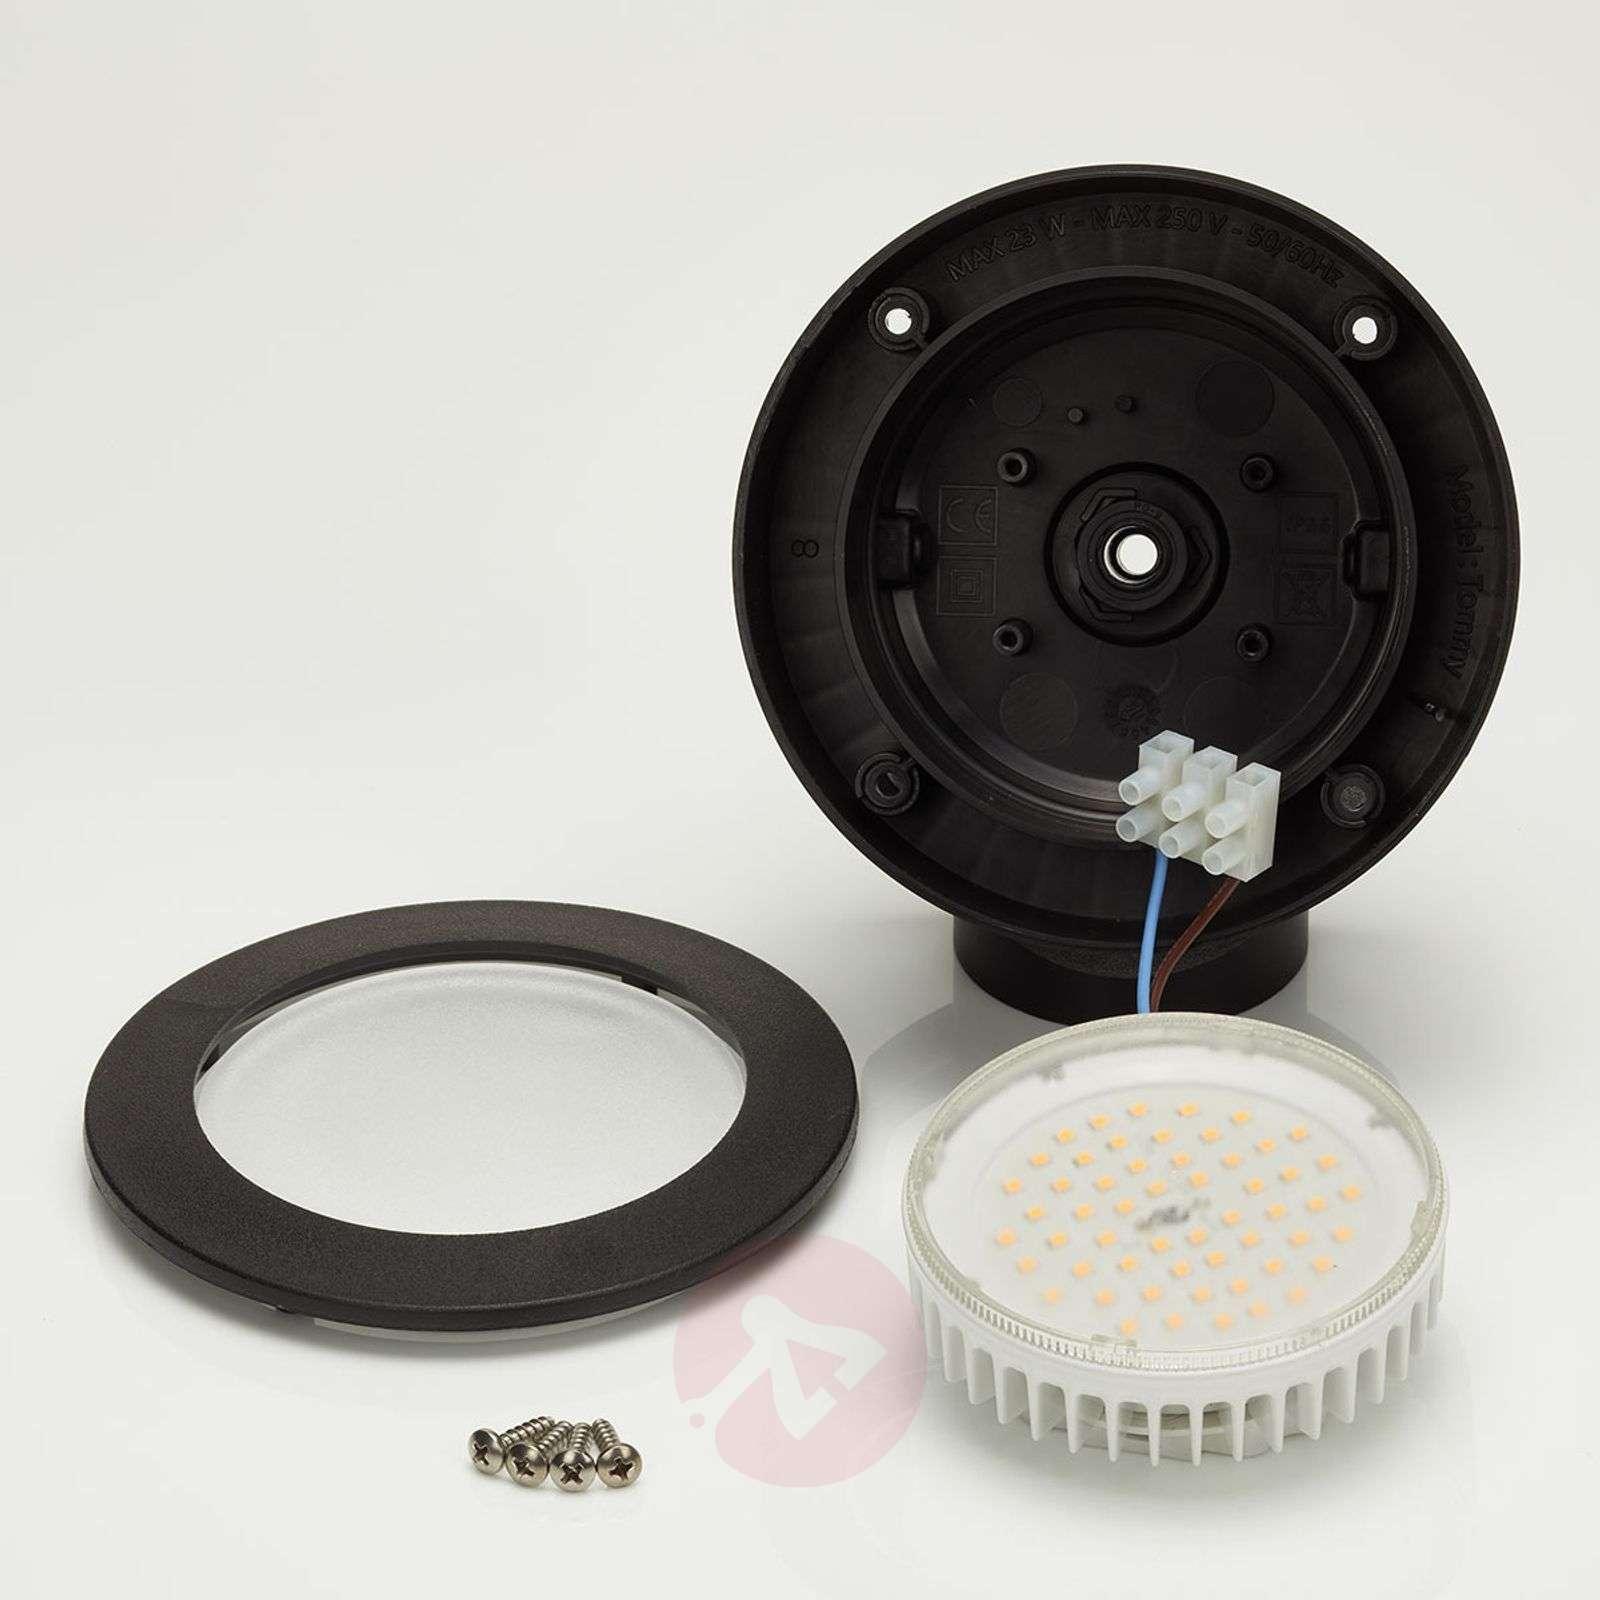 LED outdoor spotlight Tommy 10 W warm white, black-3538089-01